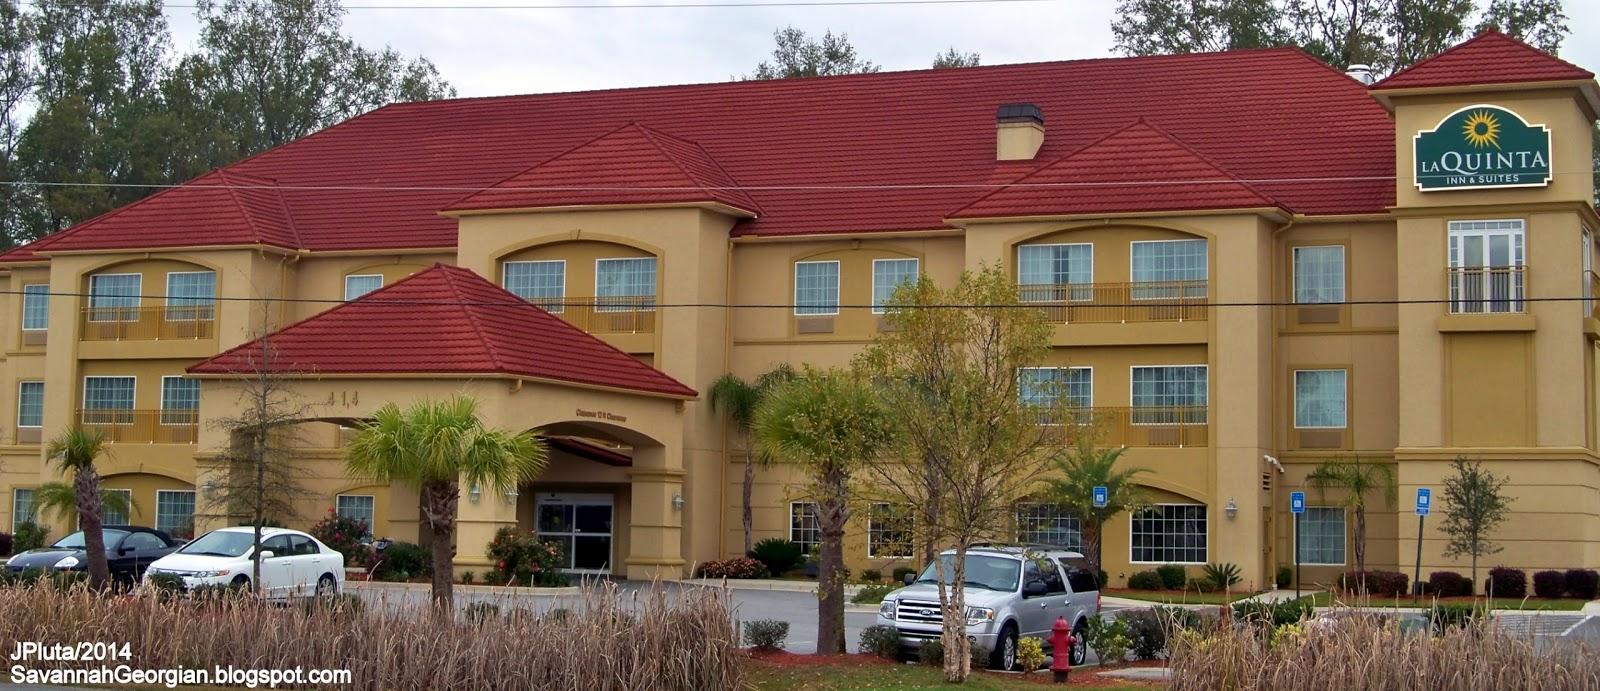 Laquinta Inn Suites Hotel Pooler Georgia Gray Street Savannah Airport I 95 Hwy 80 Exit La Quinta Lodging Ga